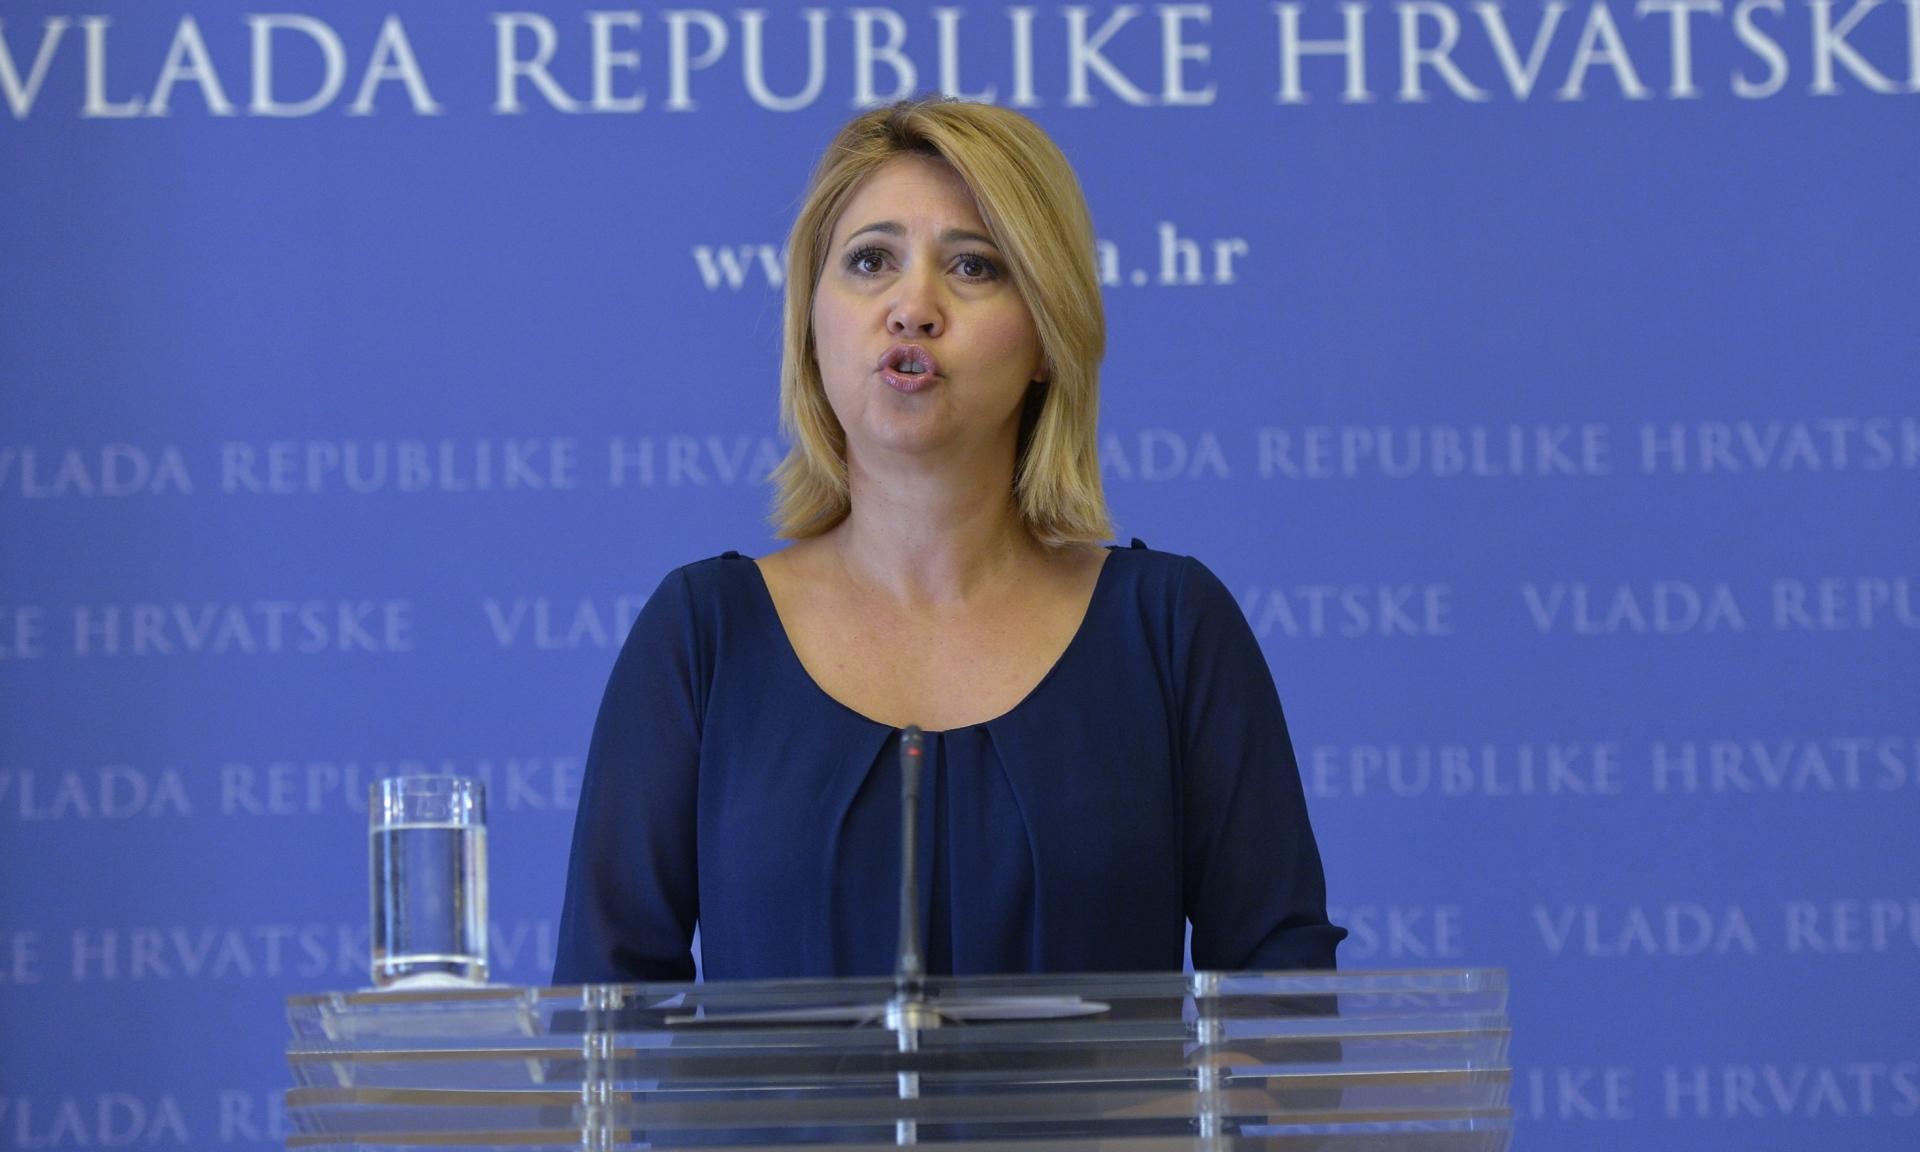 Sramotna indolencija MUP-a: Odgovornost za izbjeglice prebacili na Milanku Opačić